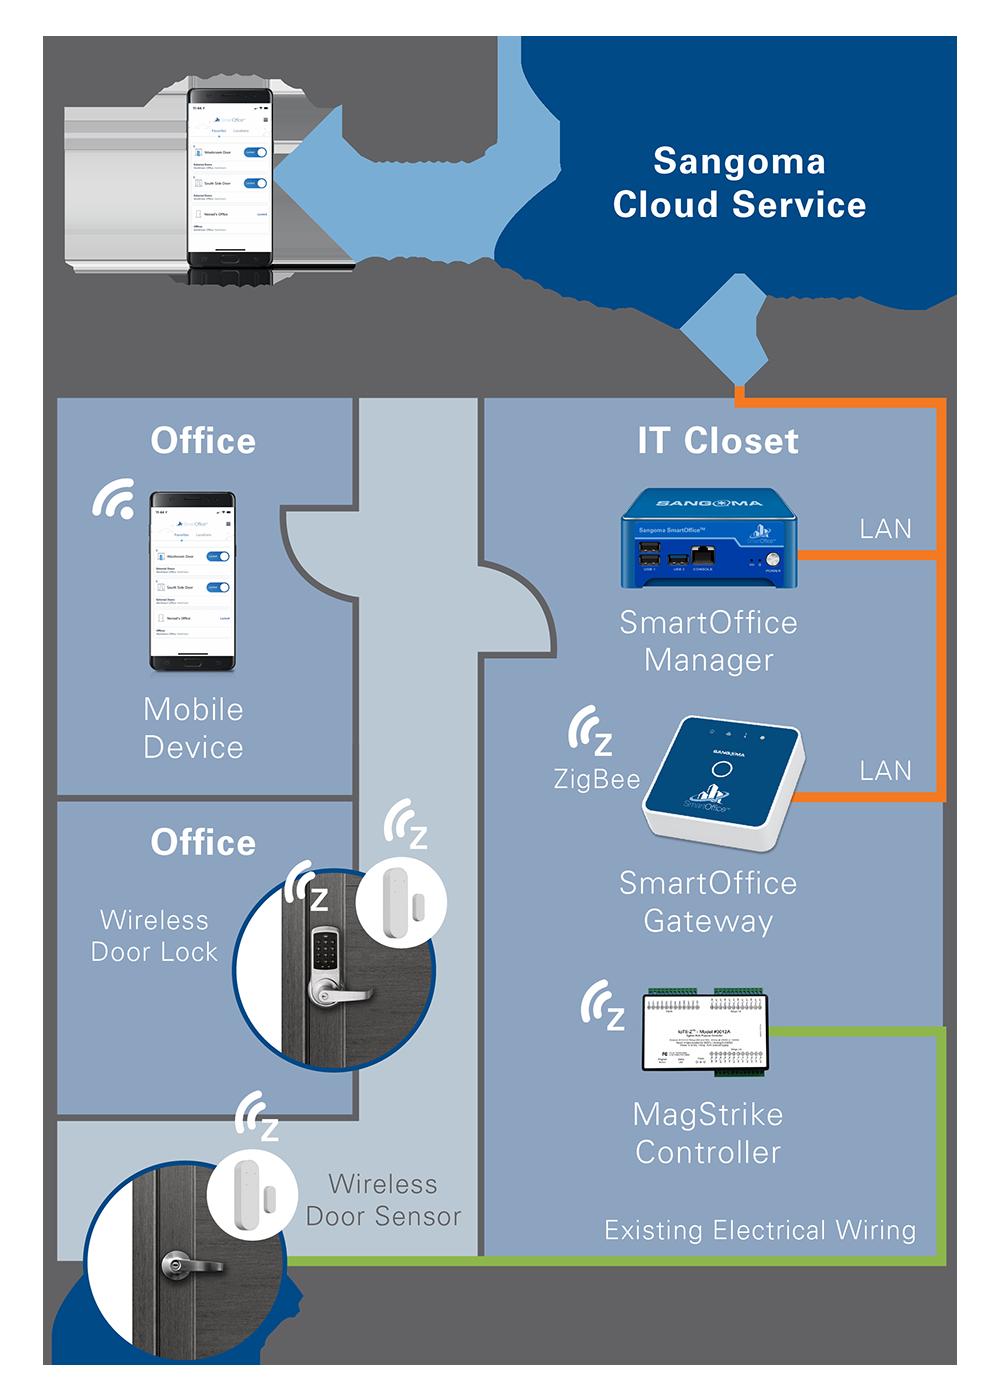 A large image showing the SmartOffice cloud service diagram